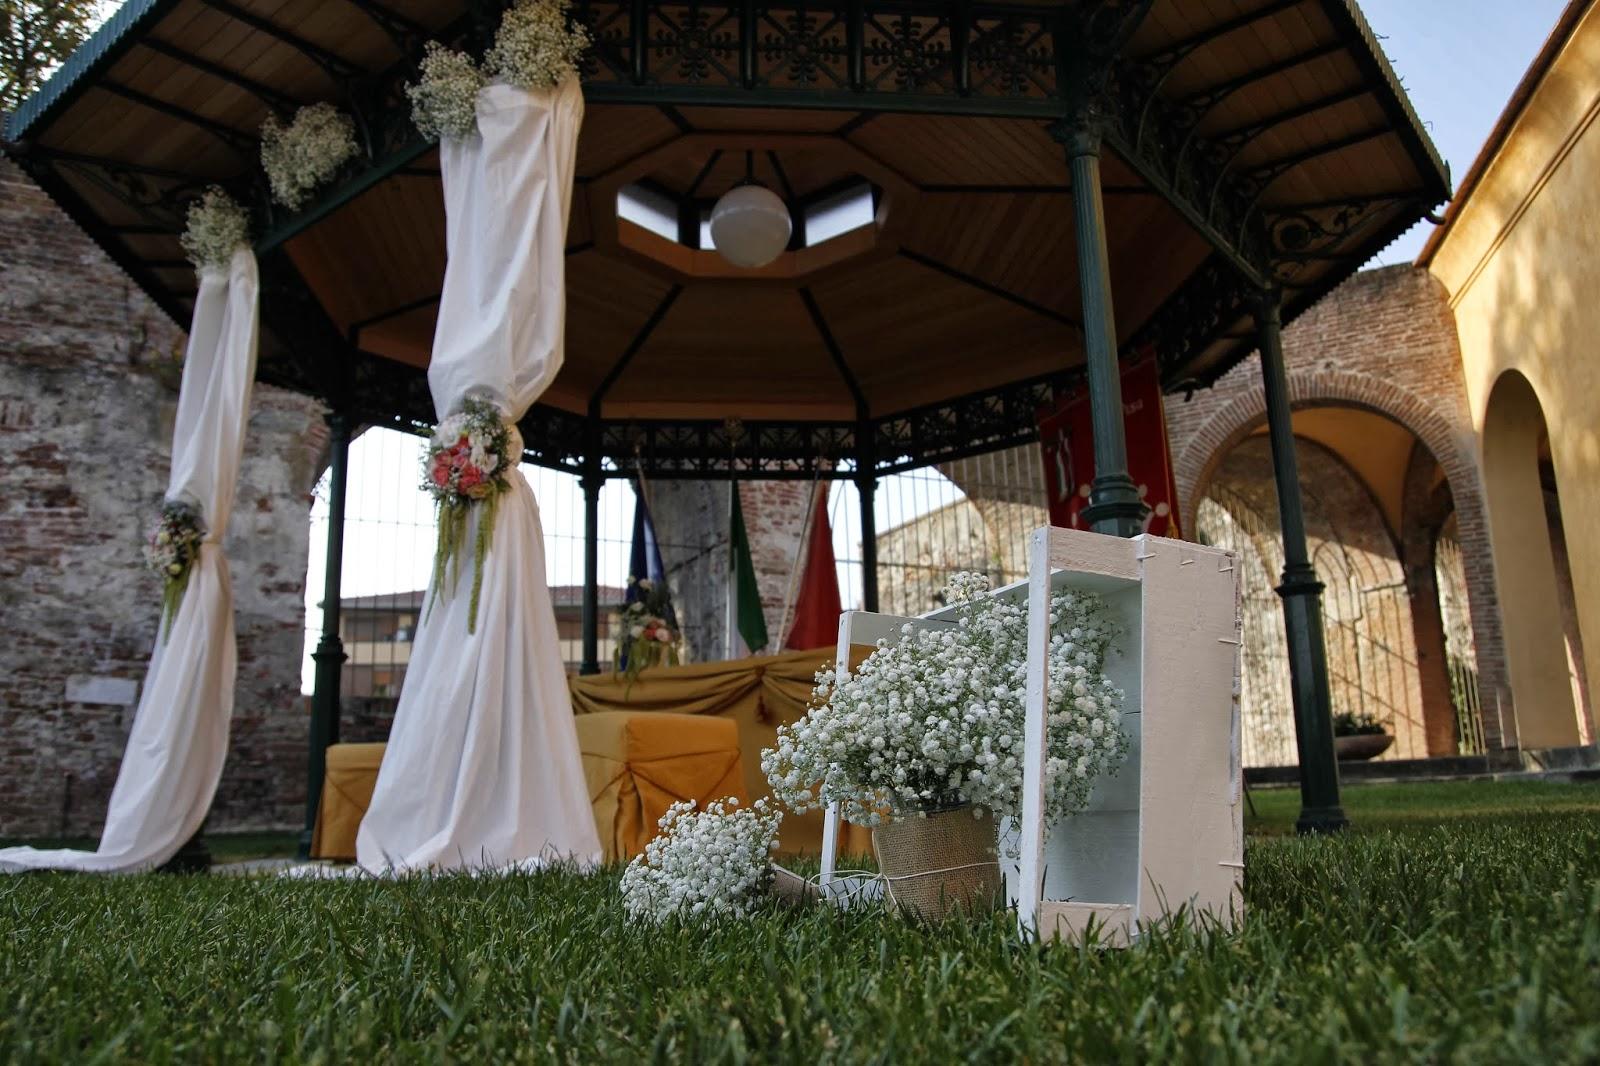 Matrimonio Country Chic Pisa : Giardino scotto pisa matrimonio